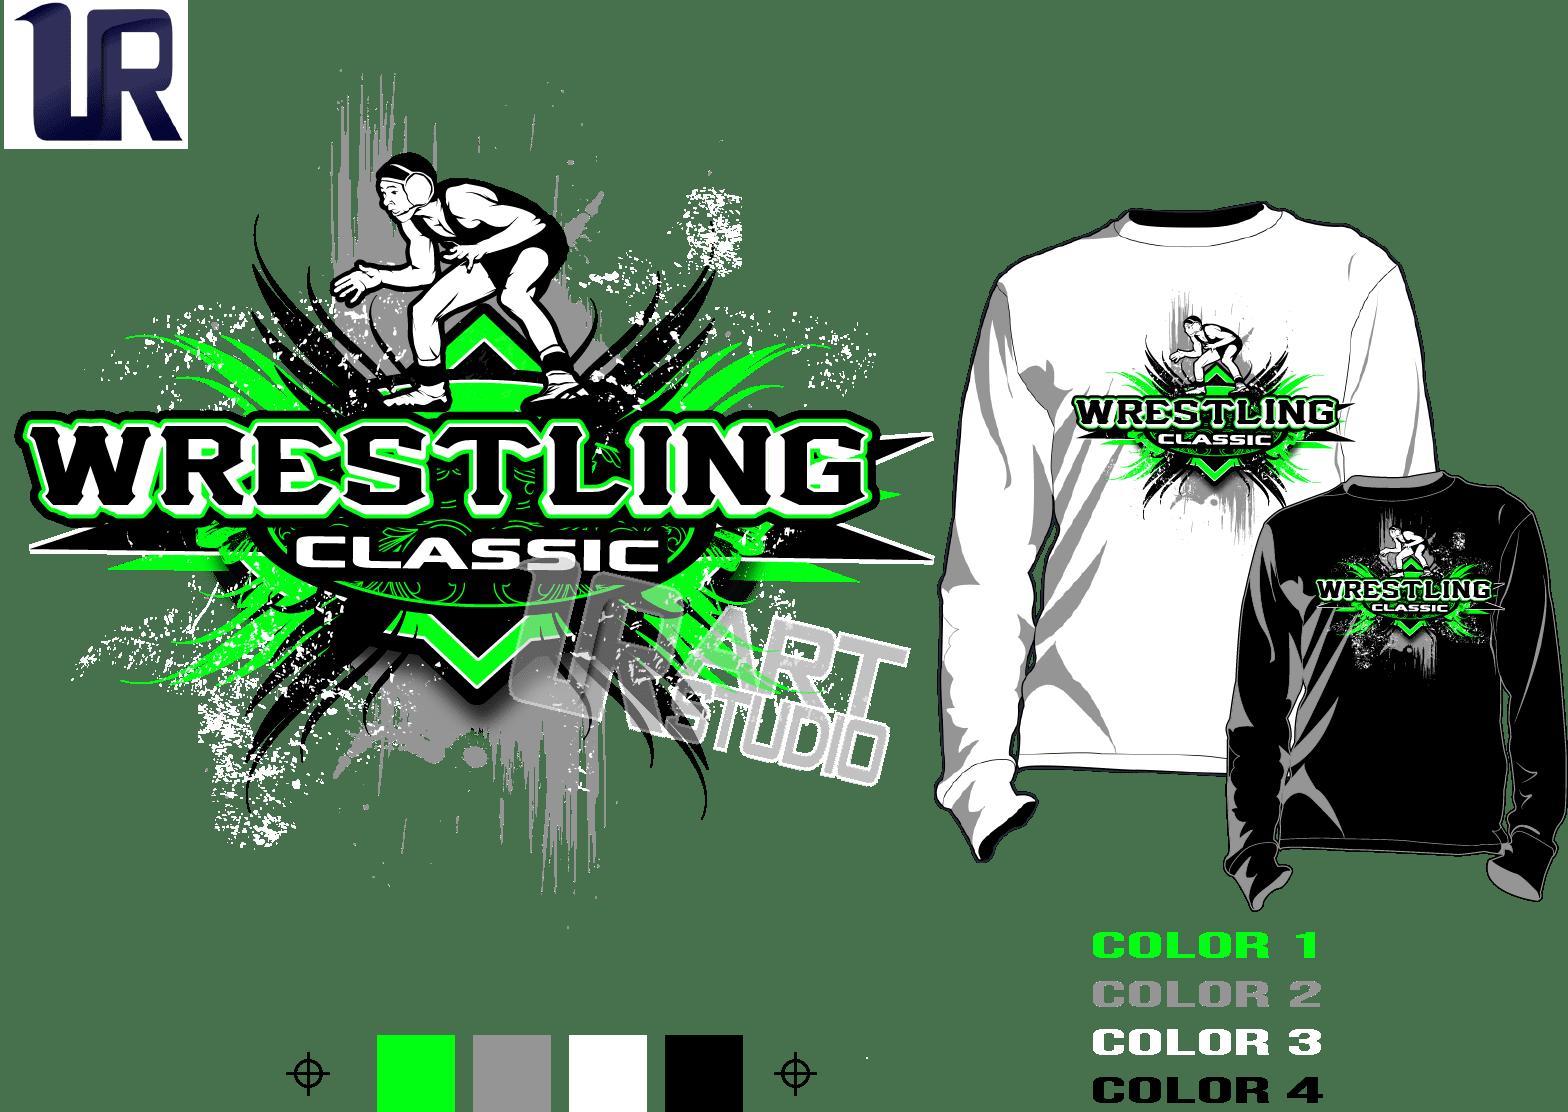 Wrestling Tshirt Vector Design Separated 4 Color Urartstudio Logos Paintings Art Lessons